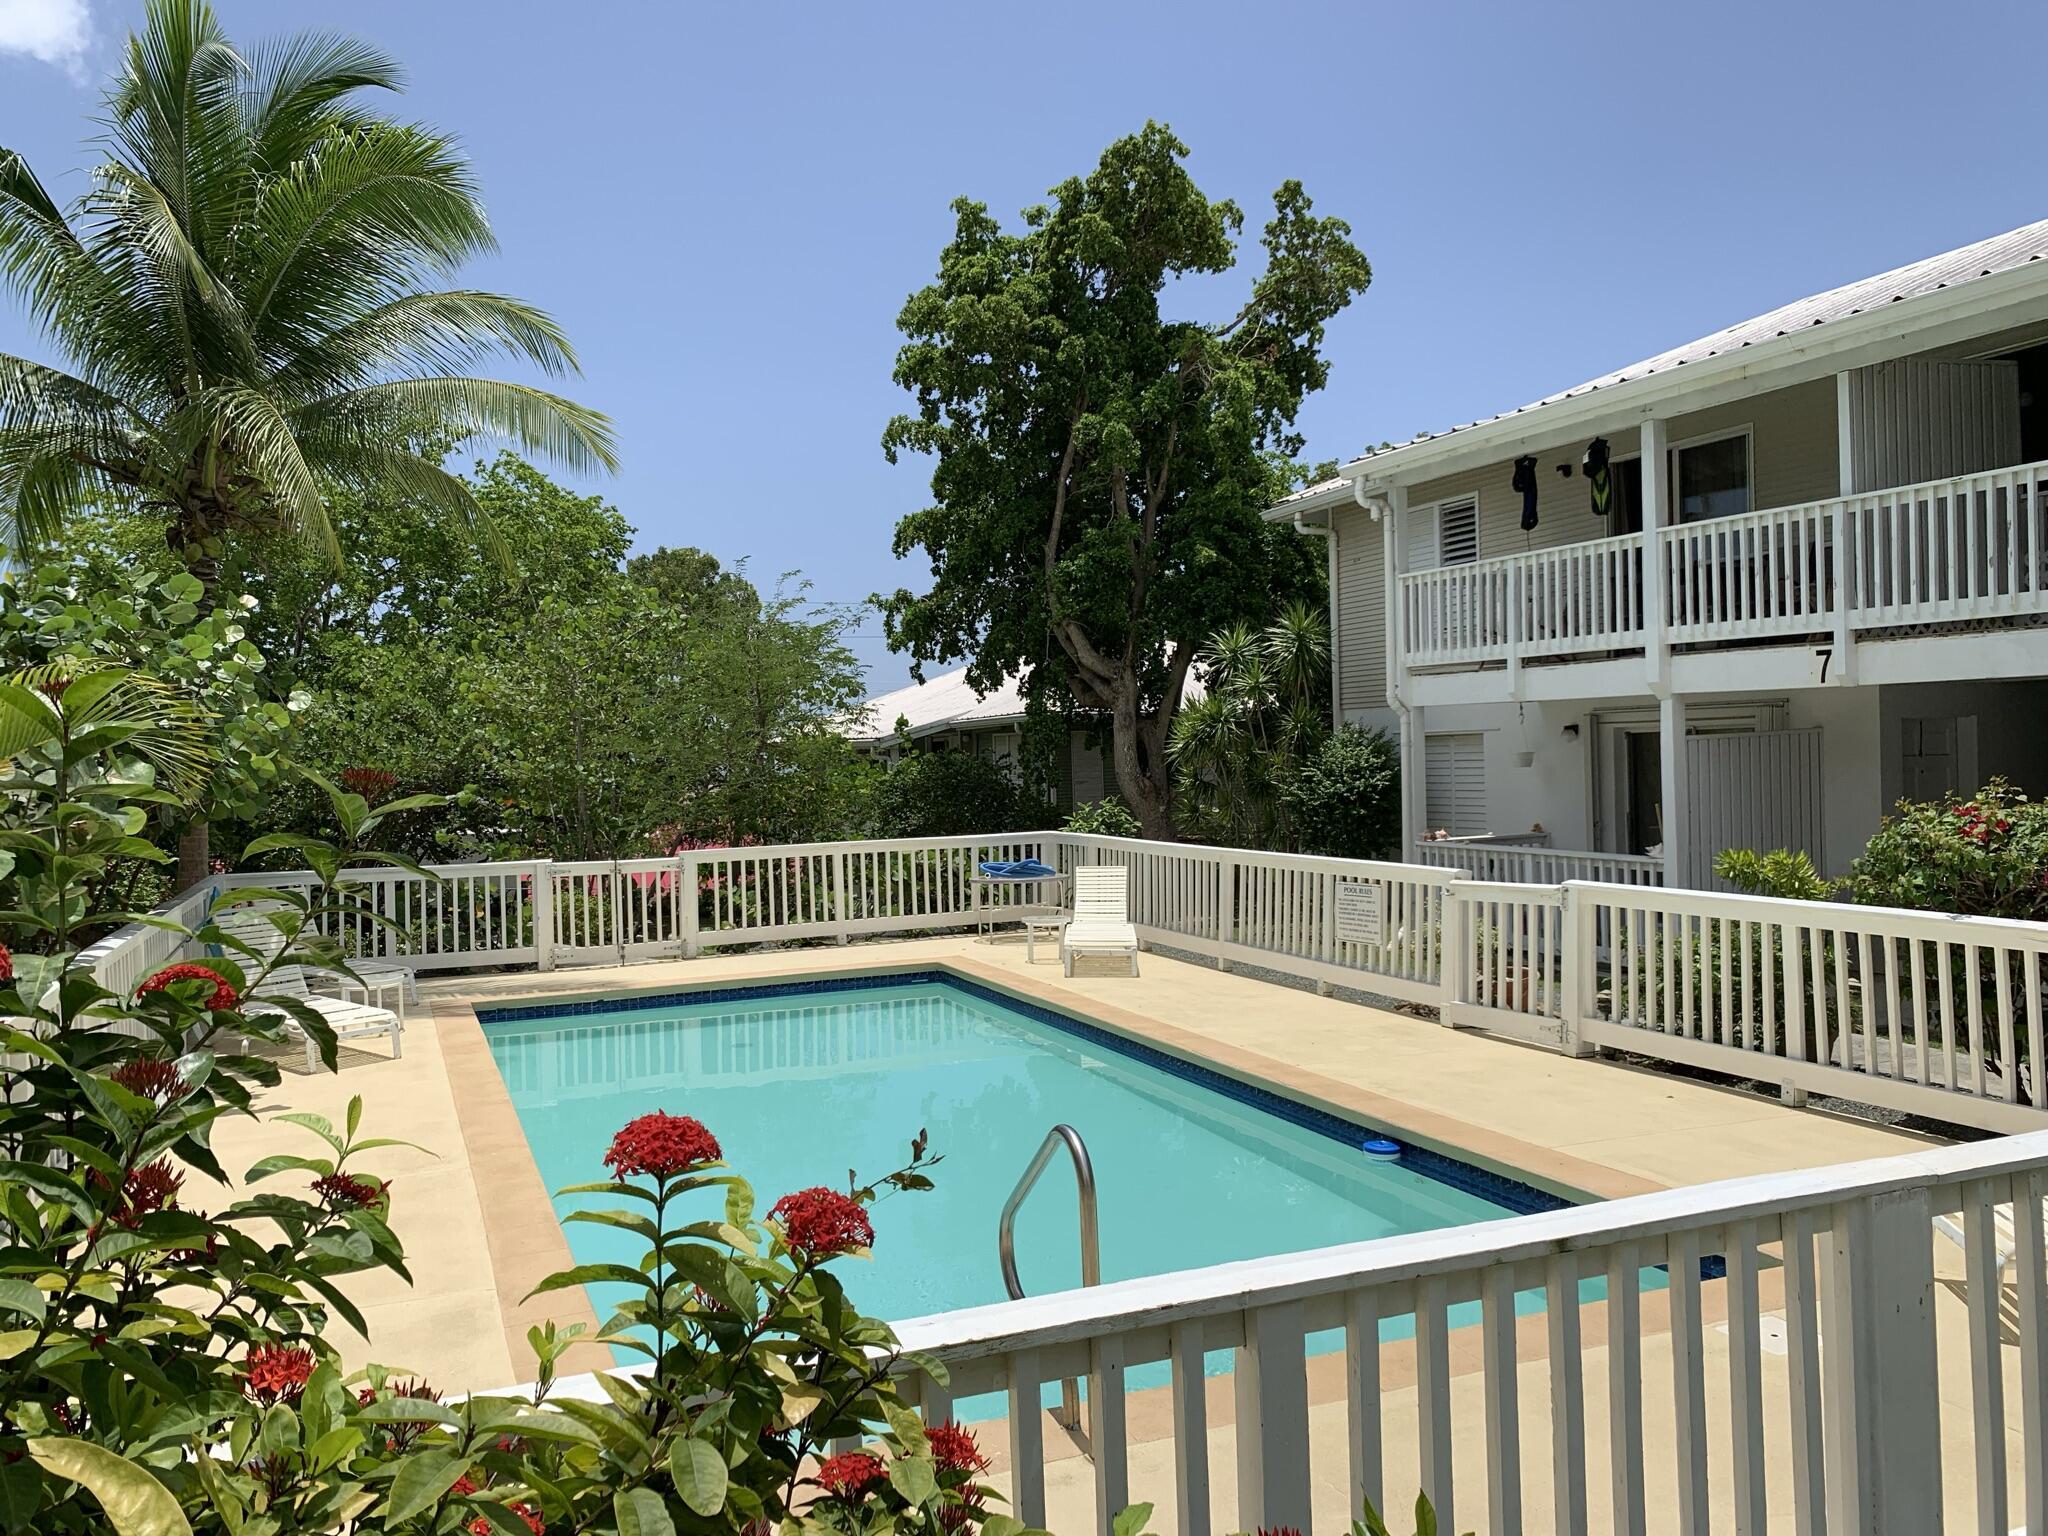 RE/MAX real estate, US Virgin Islands, Ruby, Back on Market  Condominiums  Ruby Diamond QU